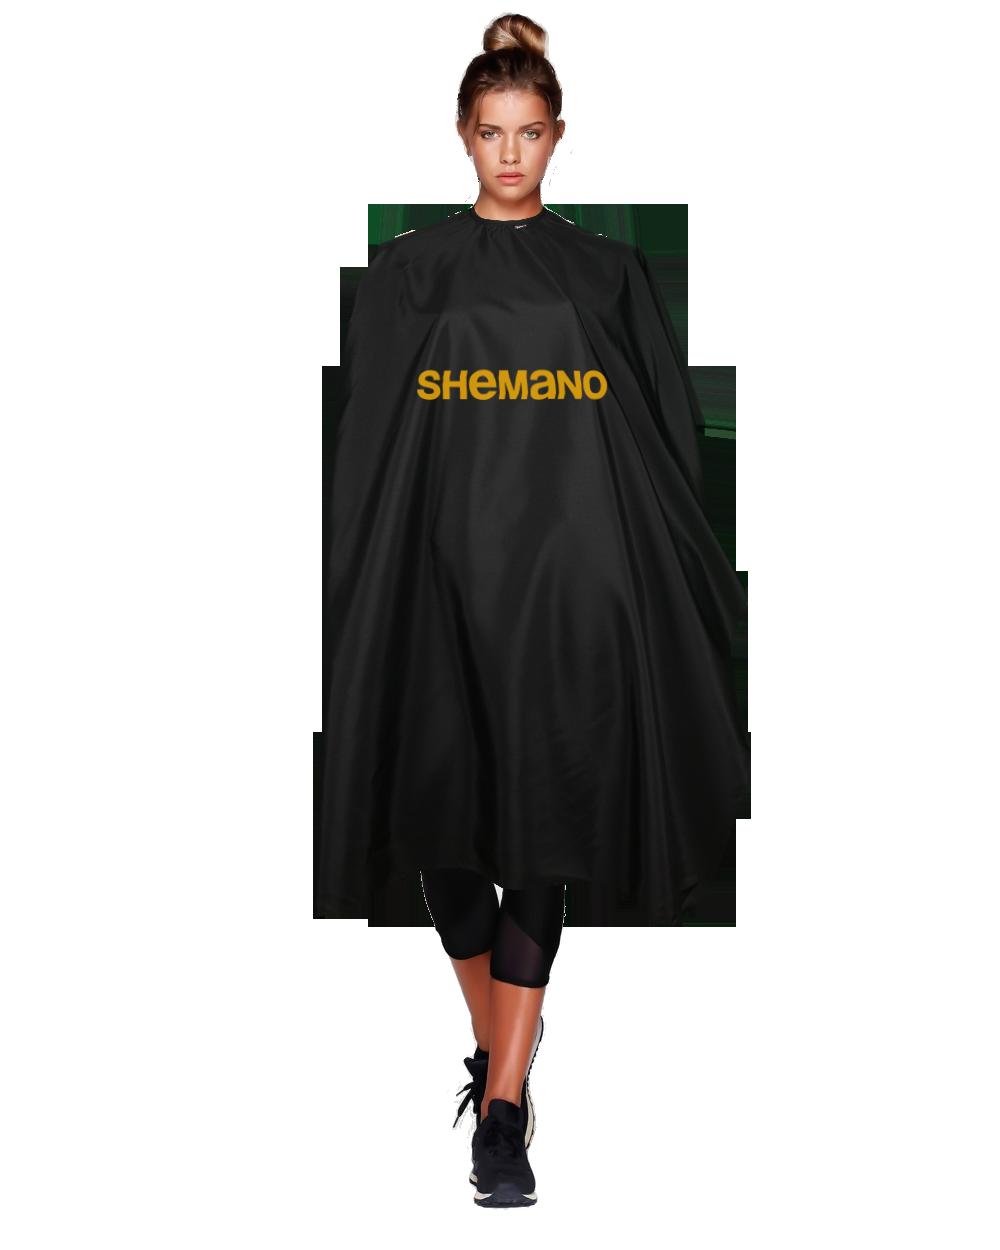 shemano-model